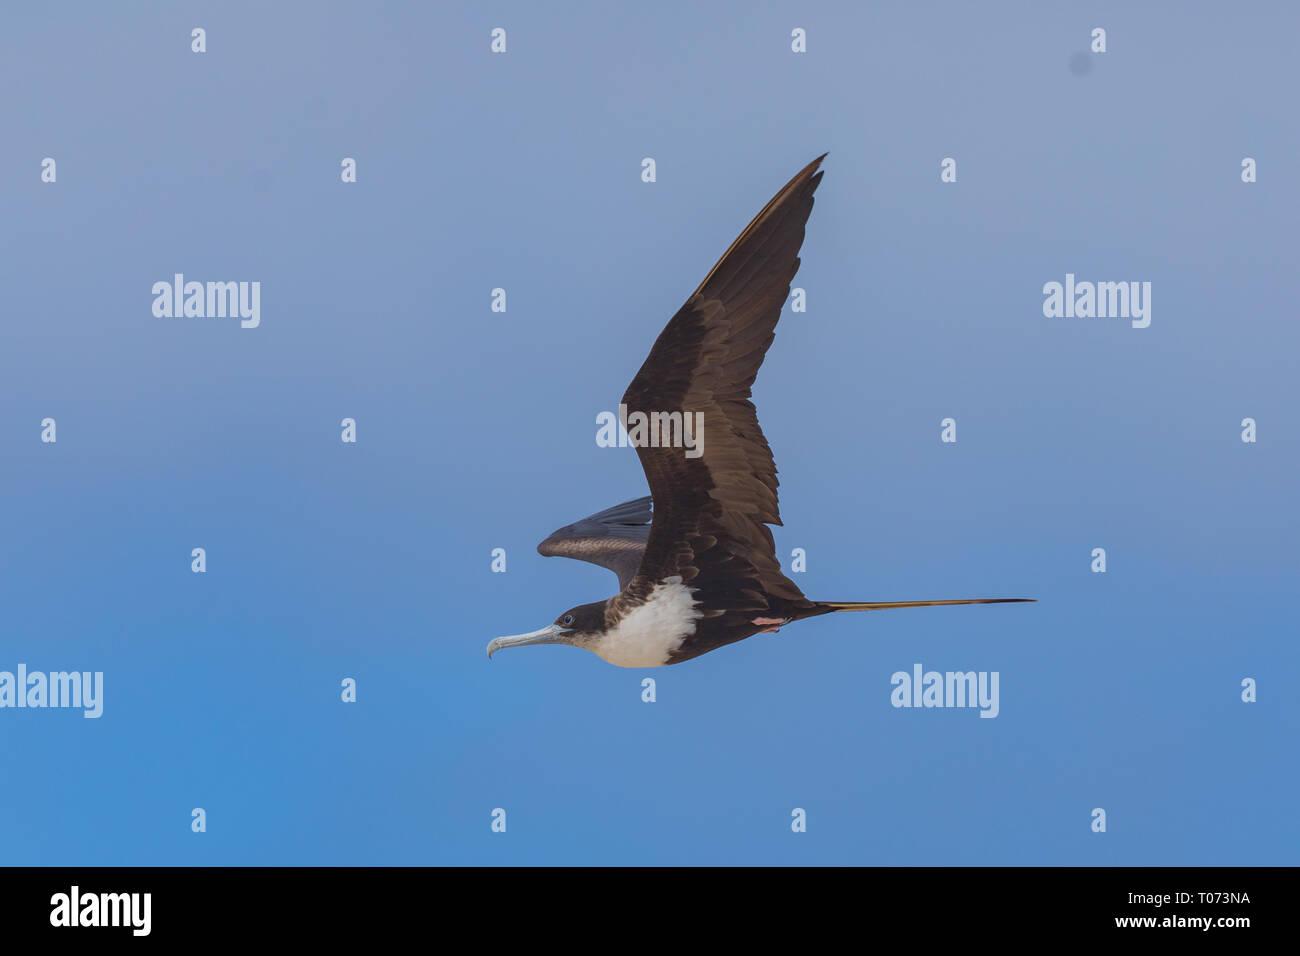 Great Frigatebird (Fregata minor) - Stock Image